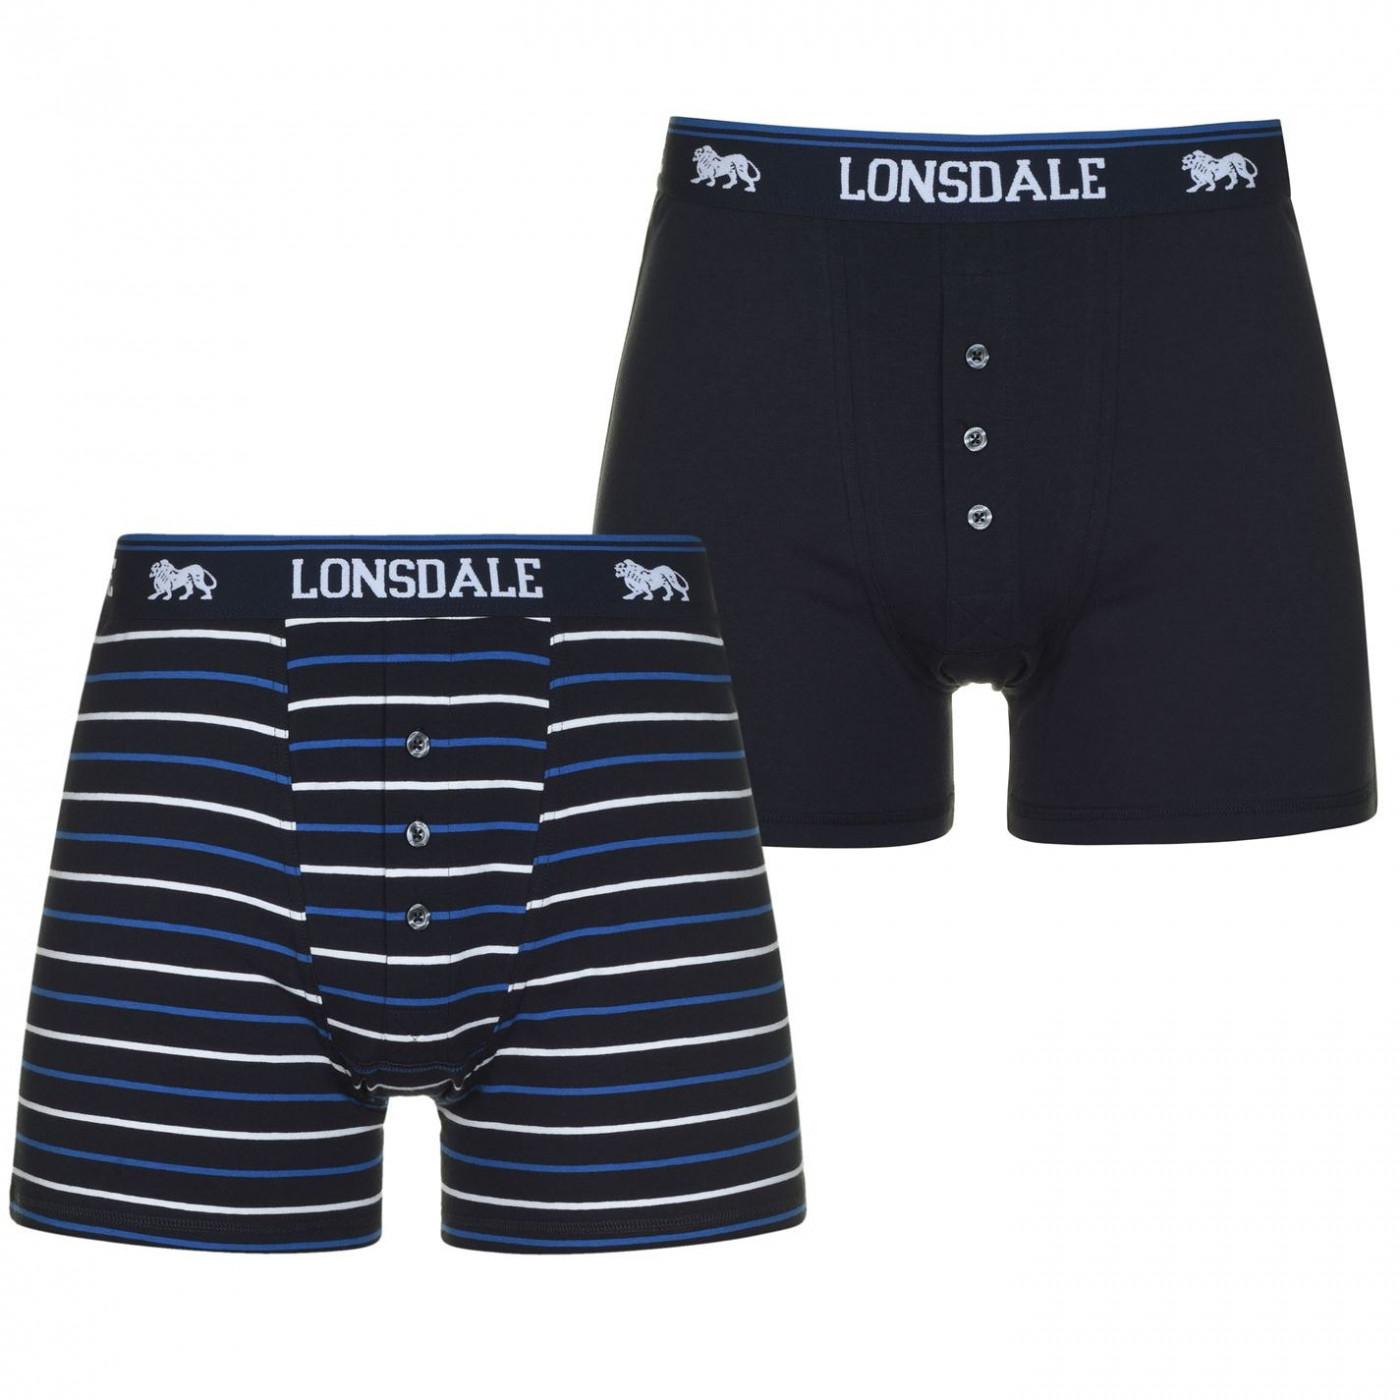 Men's boxers  Lonsdale 2 Pack